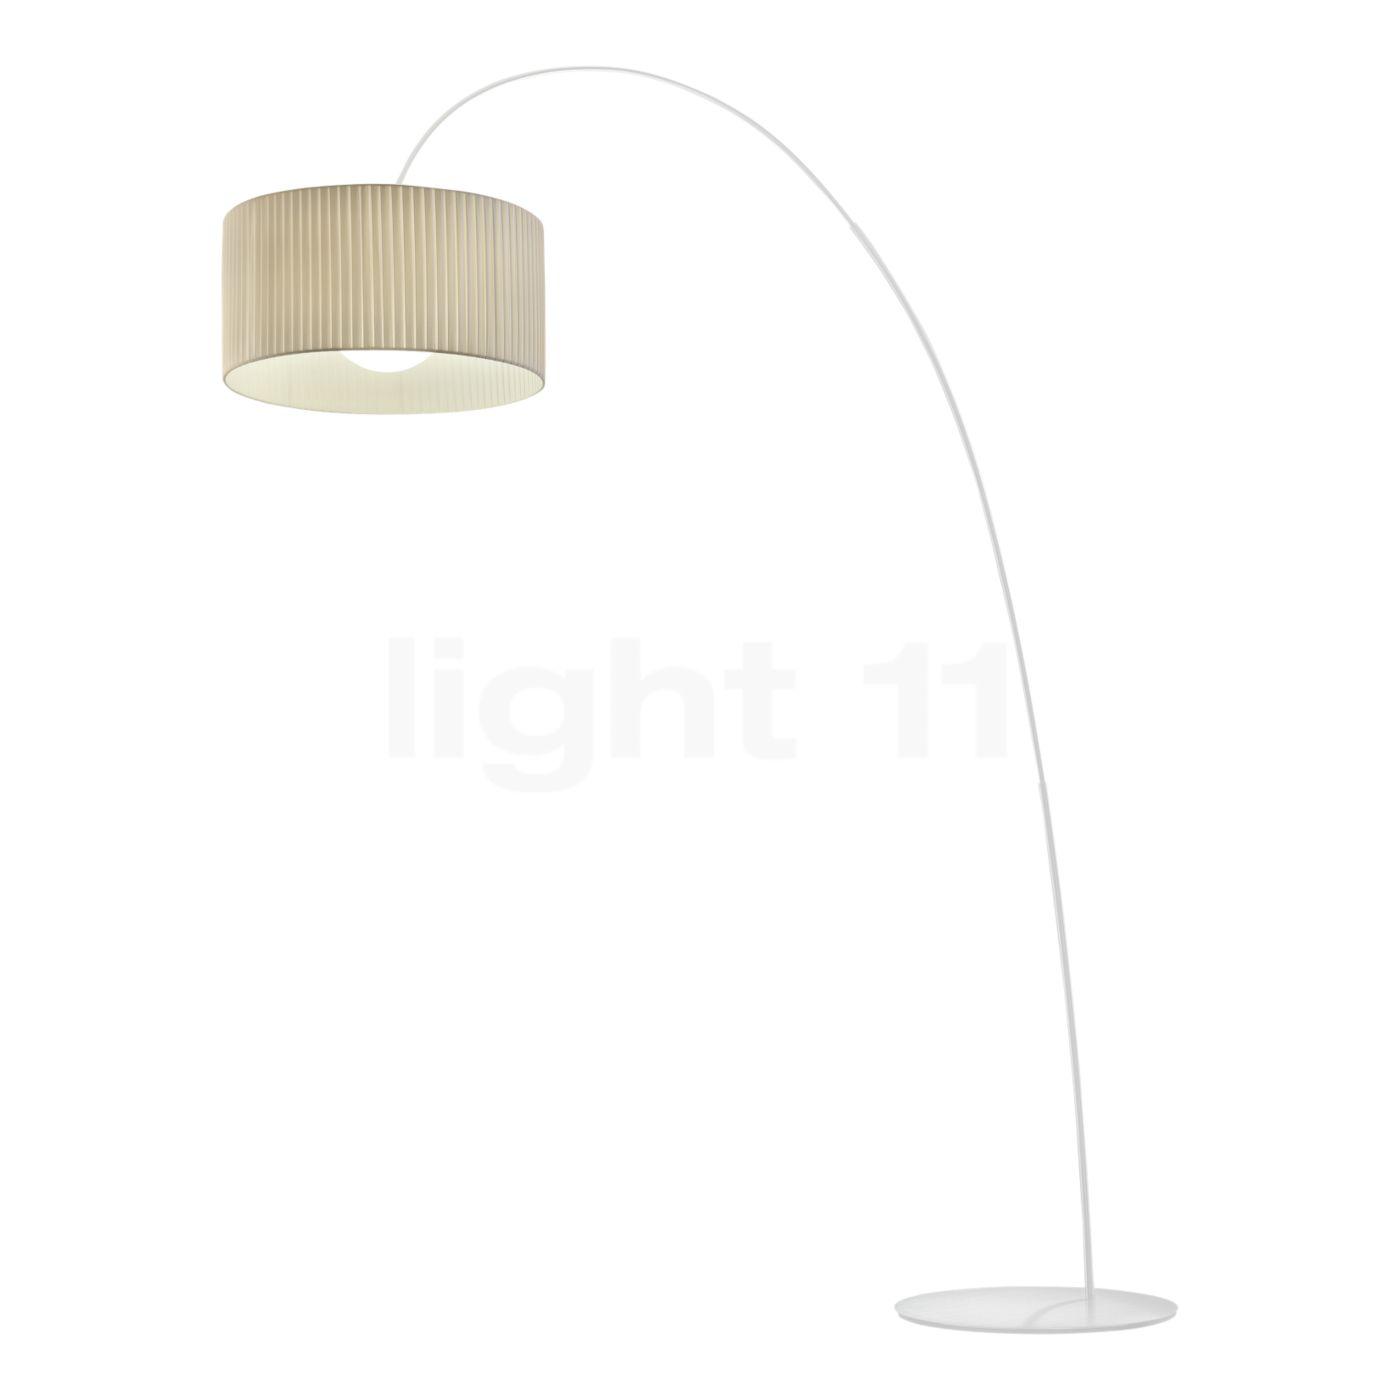 Morosini Fog Plissè lampada ad arco bianco - light11.it